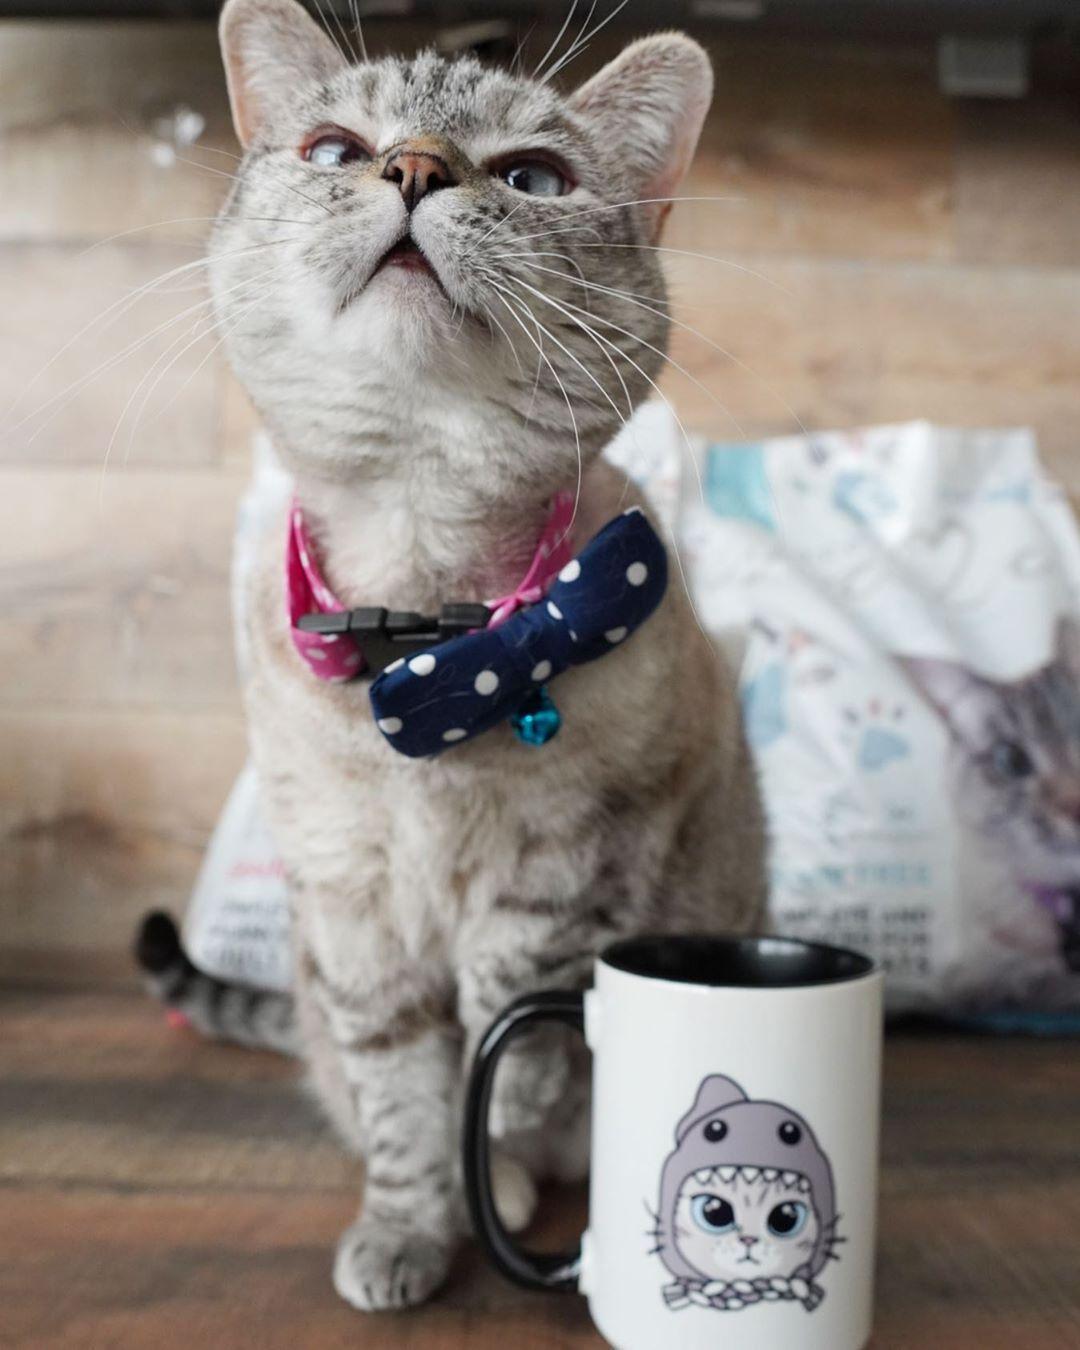 20 1k Likes 91 Comments Nala Cat Nala Cat On Instagram Informations About 20 1k Likes 91 Comments Nala In 2020 Homemade Cat Food Homemade Cat Cat Store